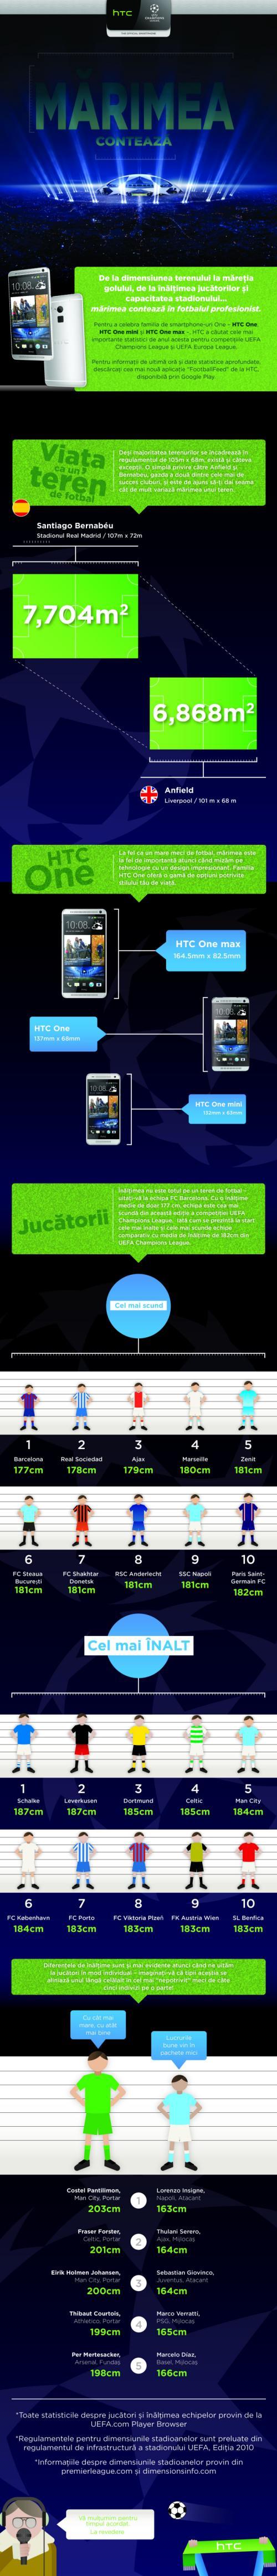 UEFA_infographic HTC-01